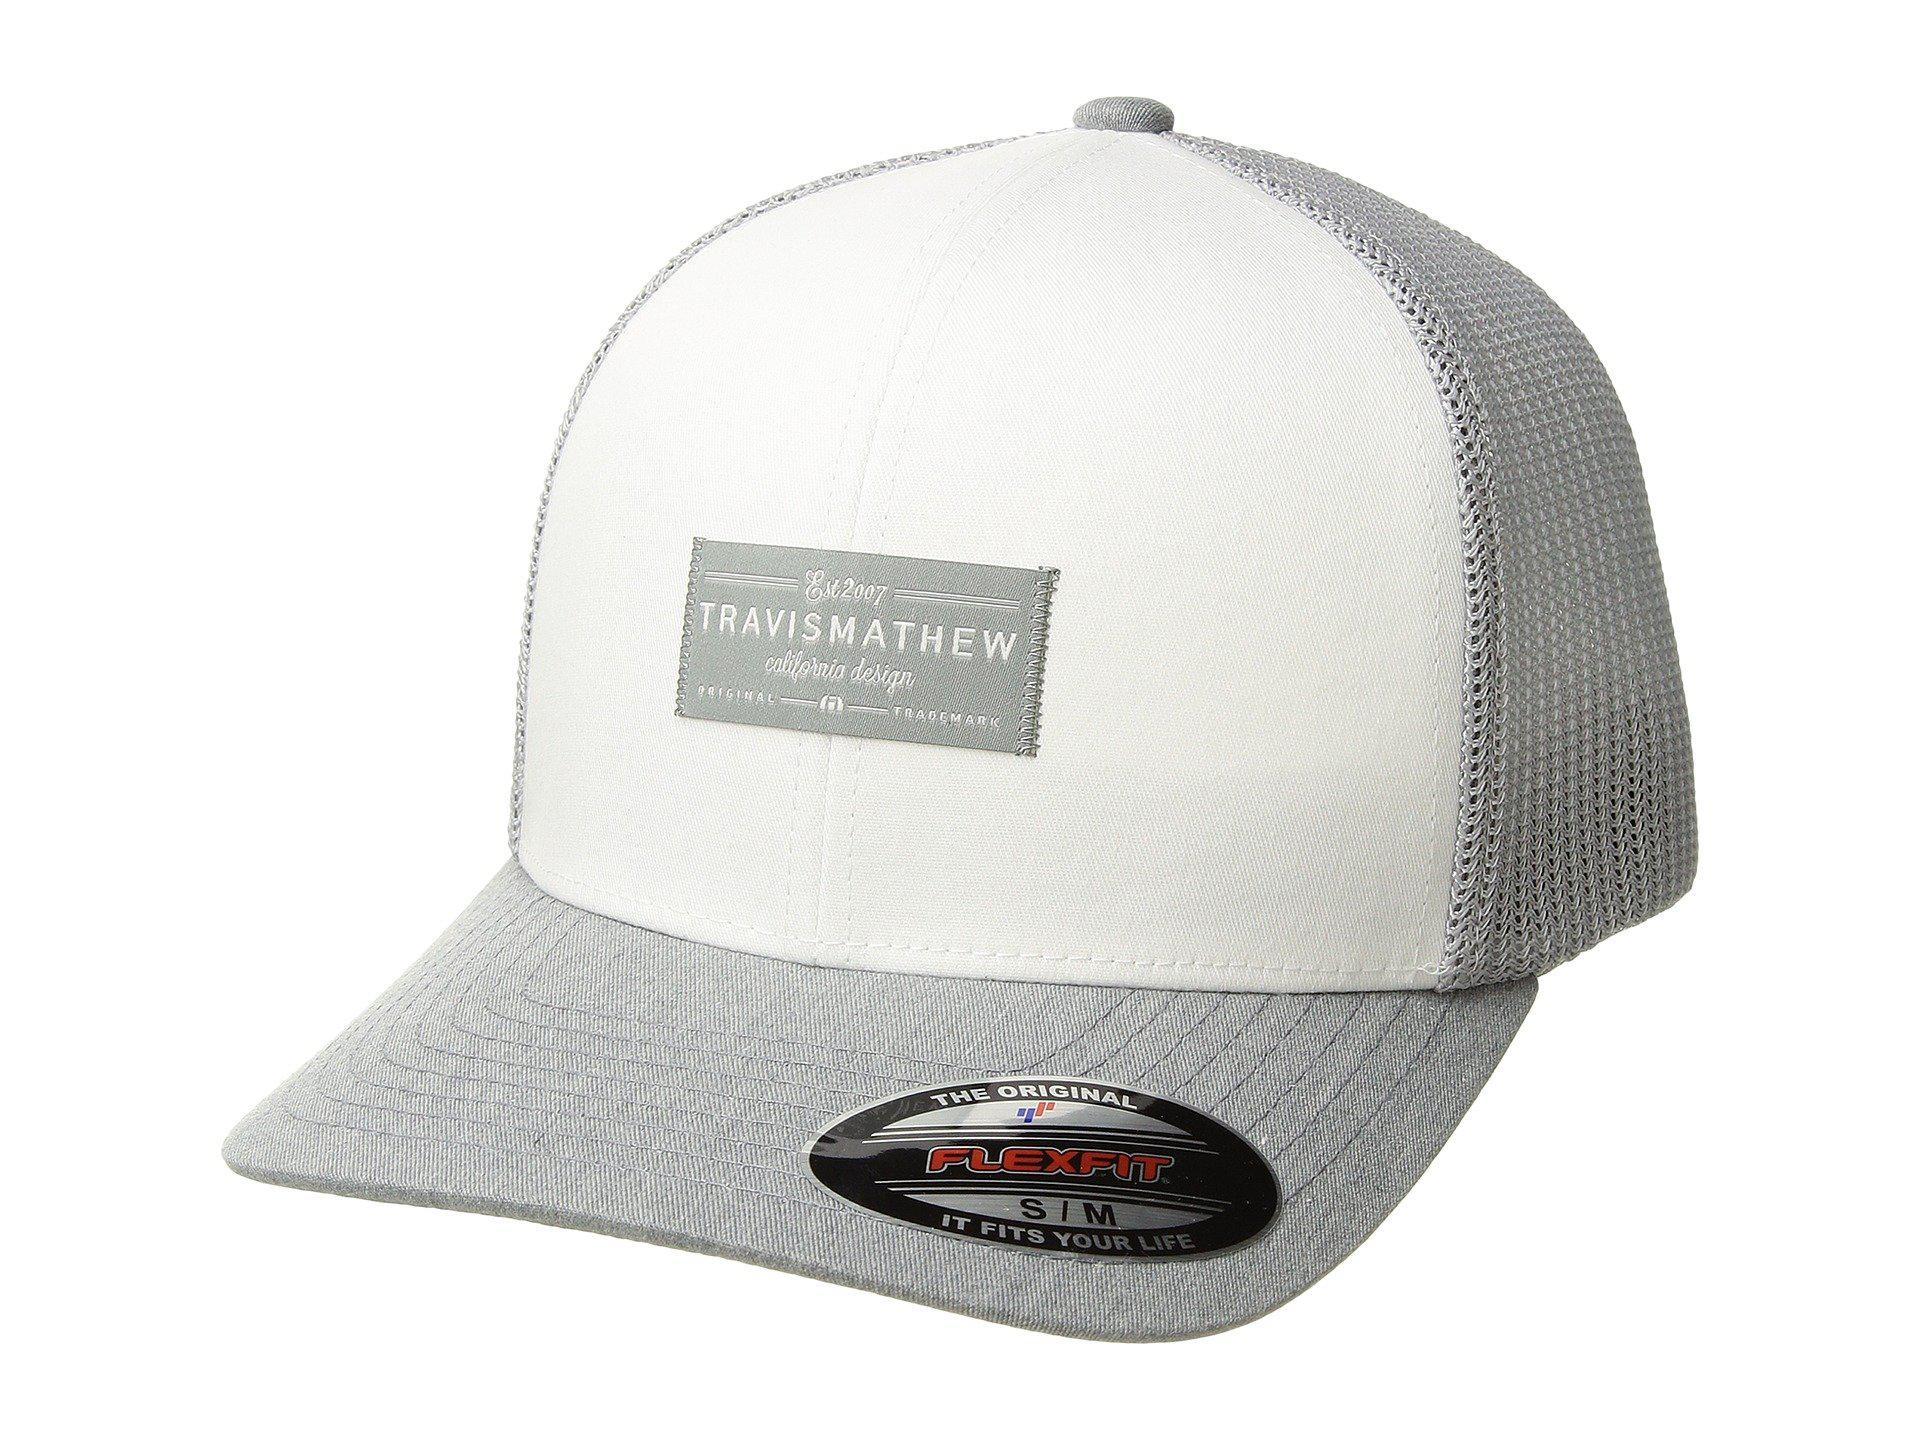 on sale 7fb02 36994 ... spain lyst travis mathew zigrat white caps in white for men 628de c1237